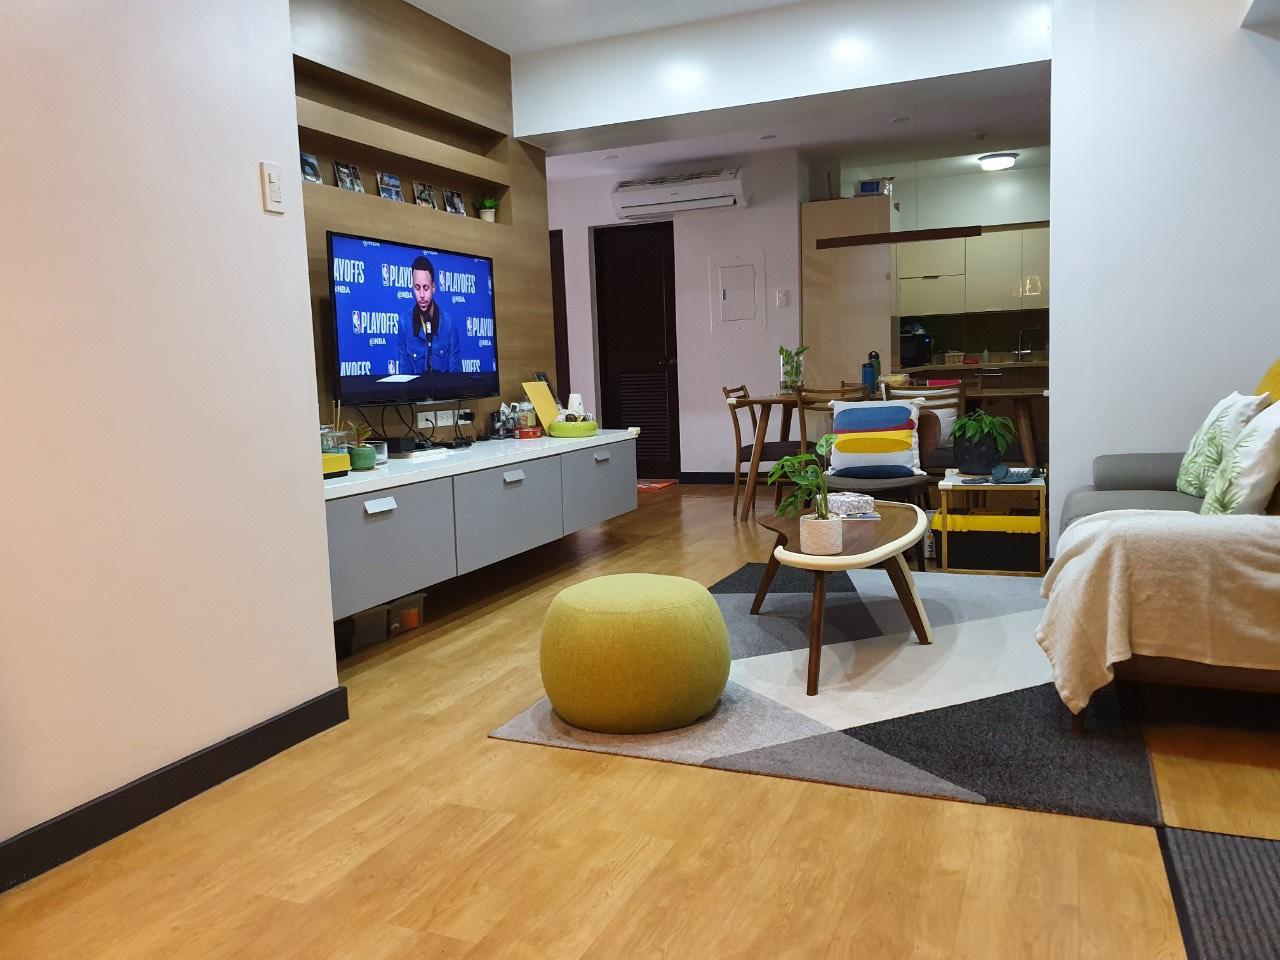 2BR Condo For Sale, Royal Palm Residences, Acacia Estate 11